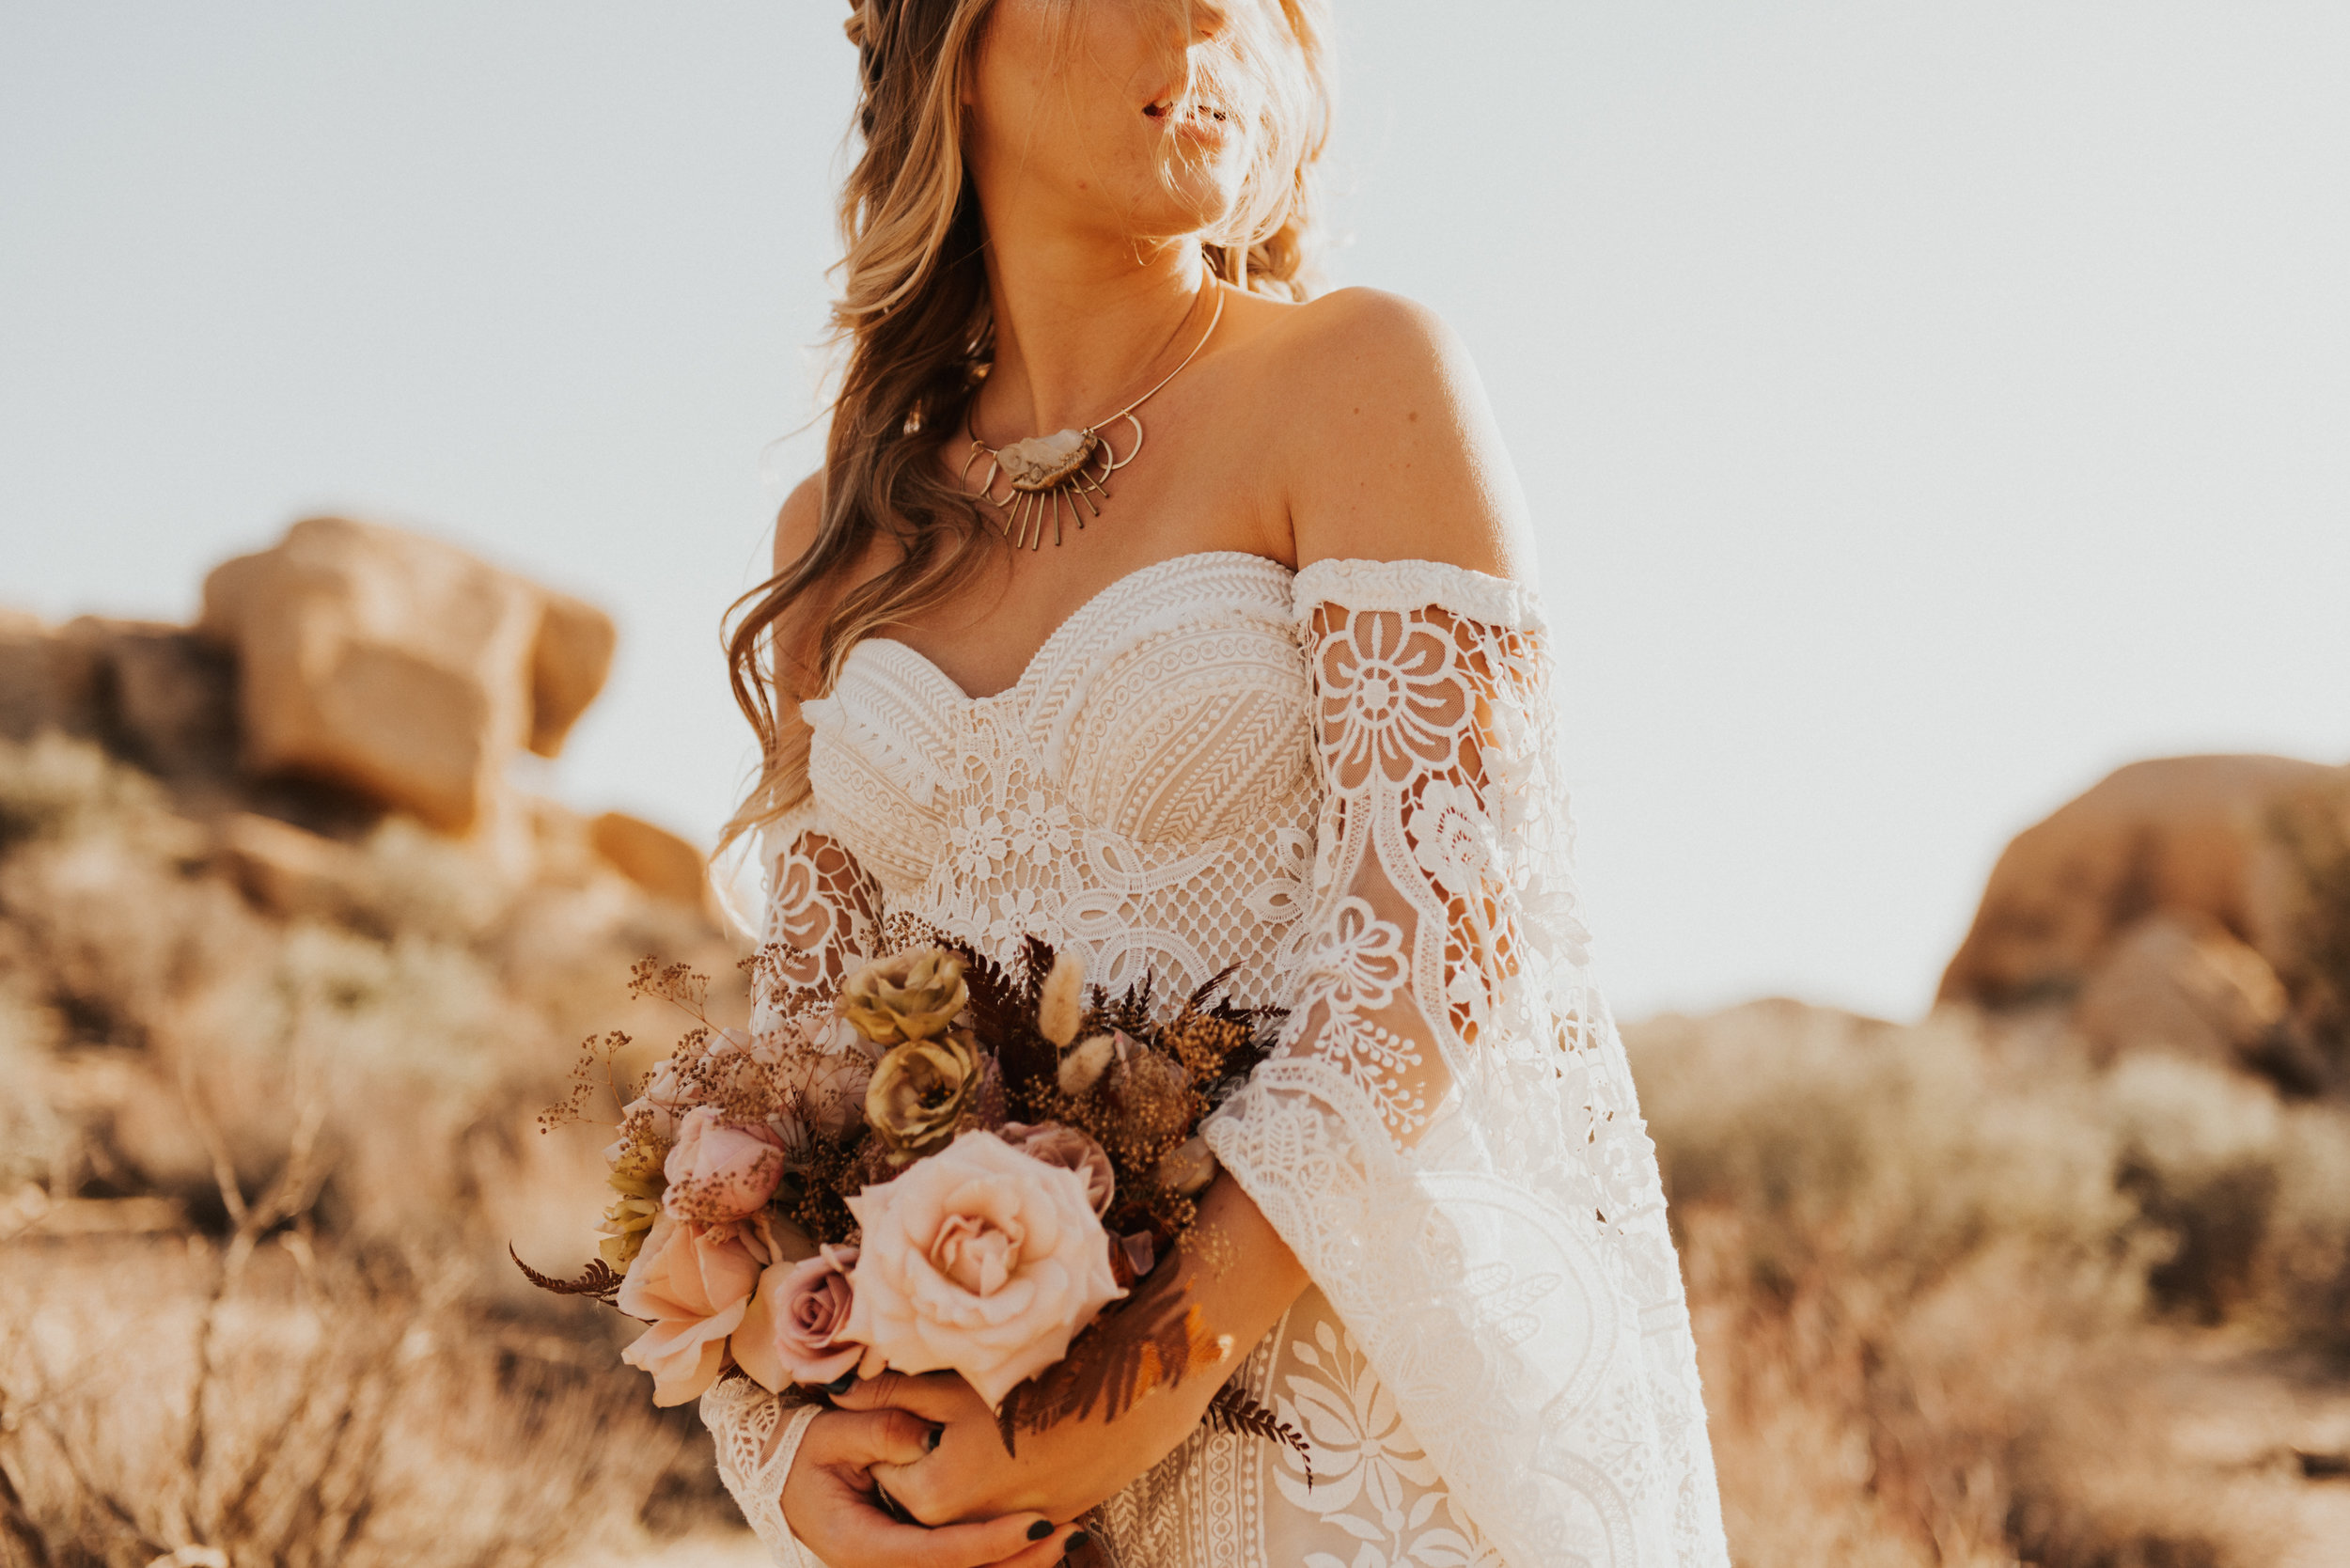 FortSt.John_photographer_TyraEPhotography_Wedding_Couple_Family_Photograhy_DawsonCreek_Elopement_Bride_Boduoir_Portraits-4927.jpg